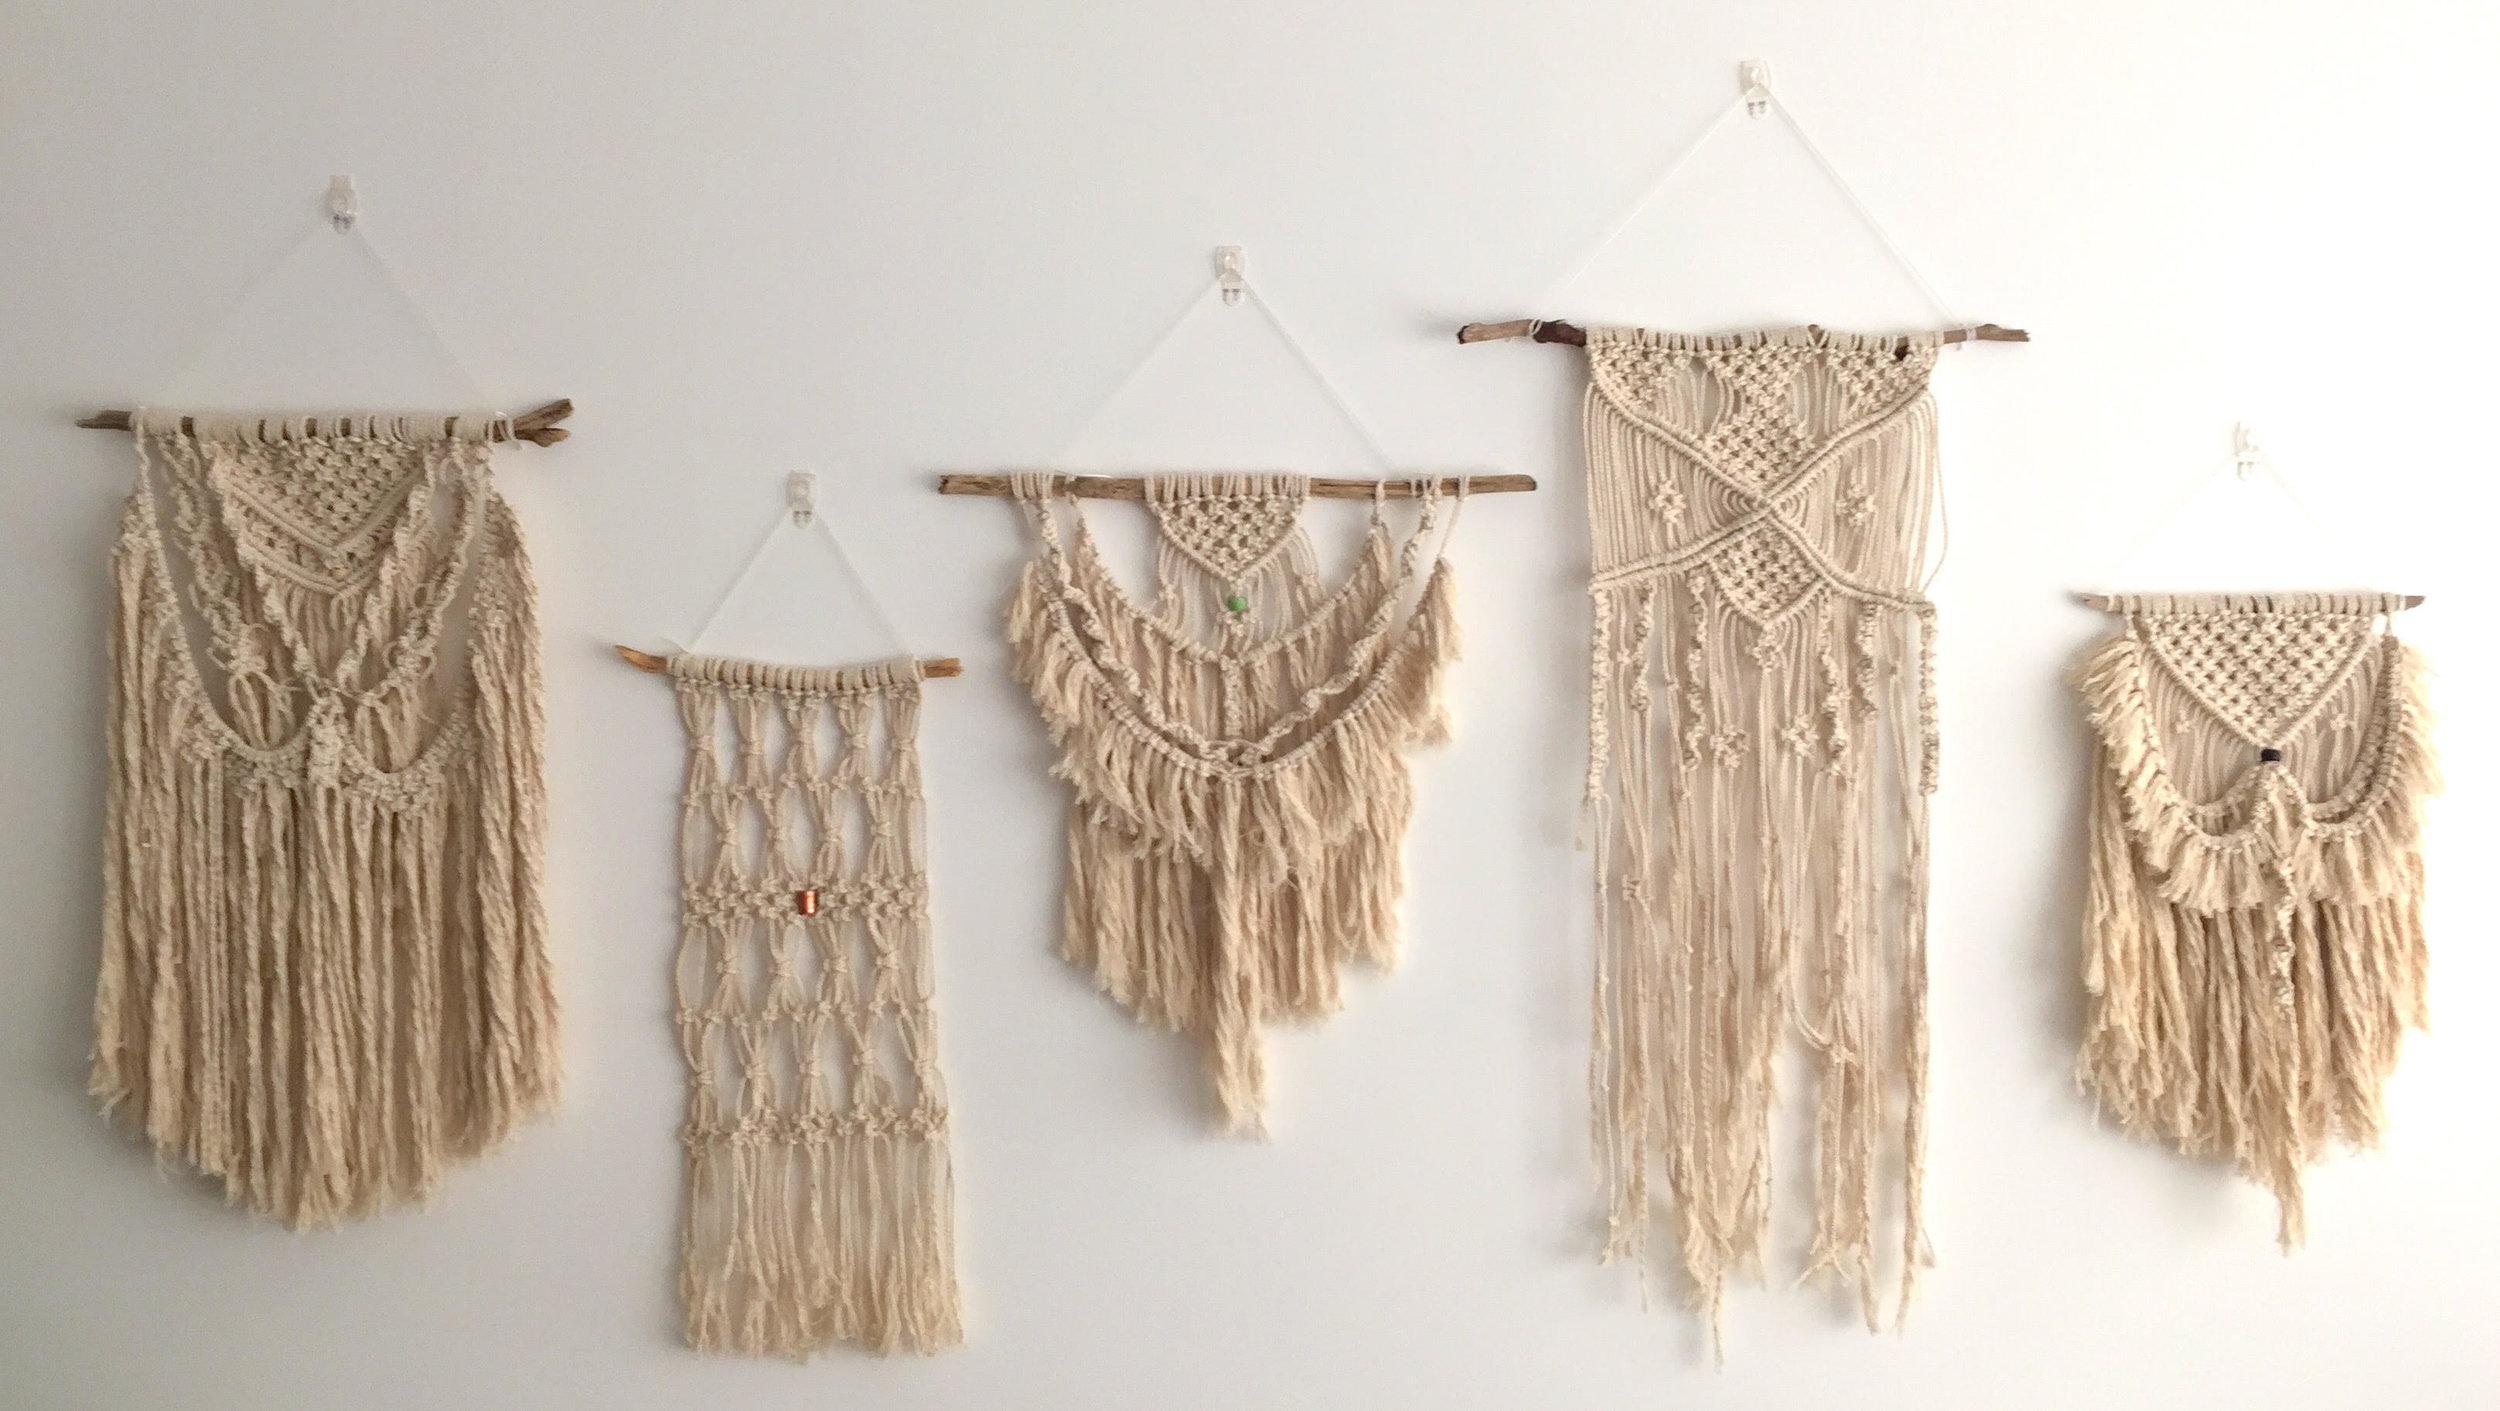 Paper_and_Moon_Louise_Dockery_interior_design_Dublin_Ireland_wall_hanging_macrame_weaving_Weaverella_Emma_Carroll_boho.jpg